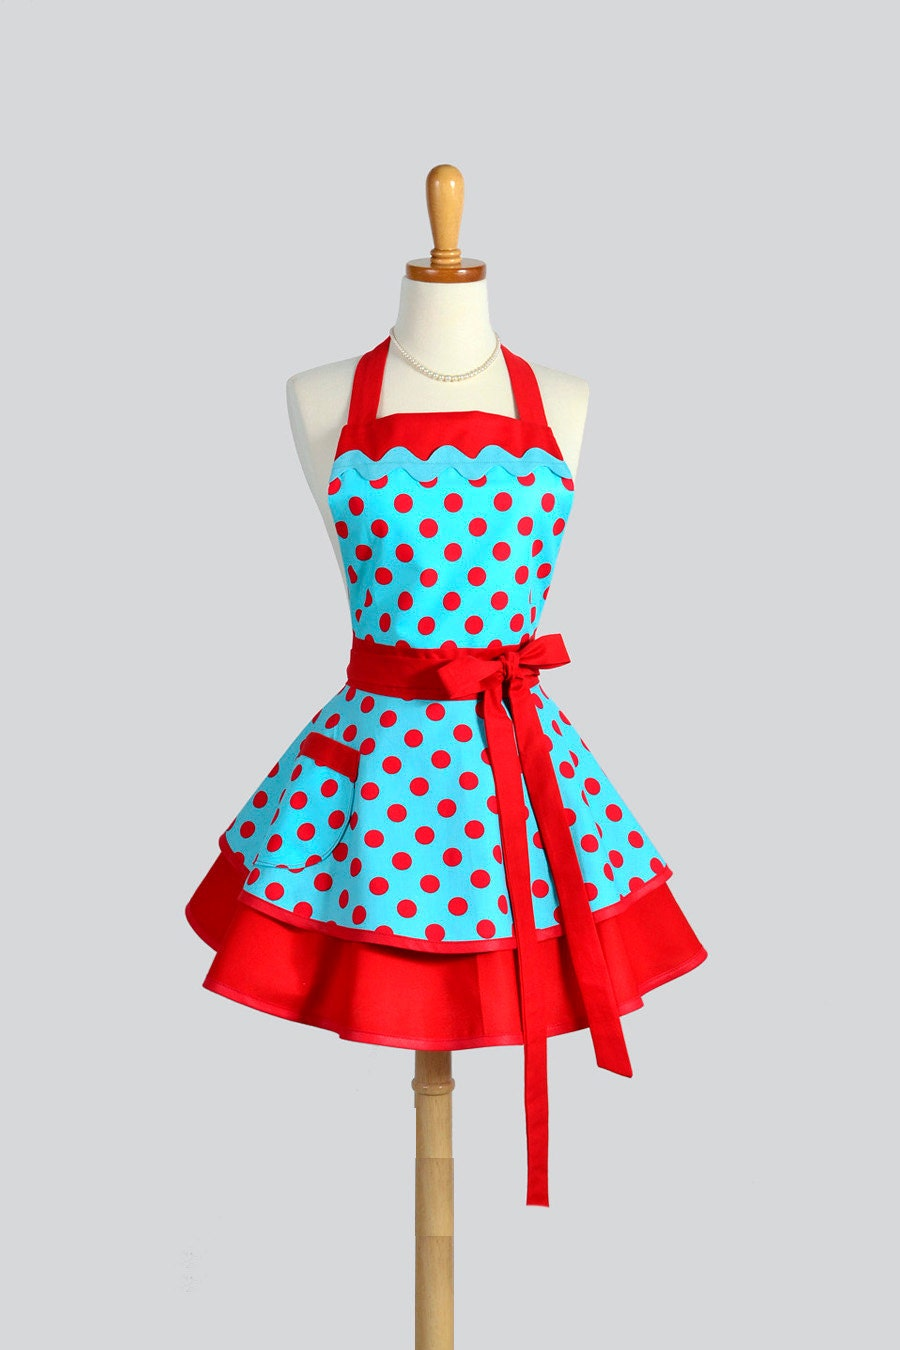 ruffled retro apron woman apron pinup woman apron vintage. Black Bedroom Furniture Sets. Home Design Ideas